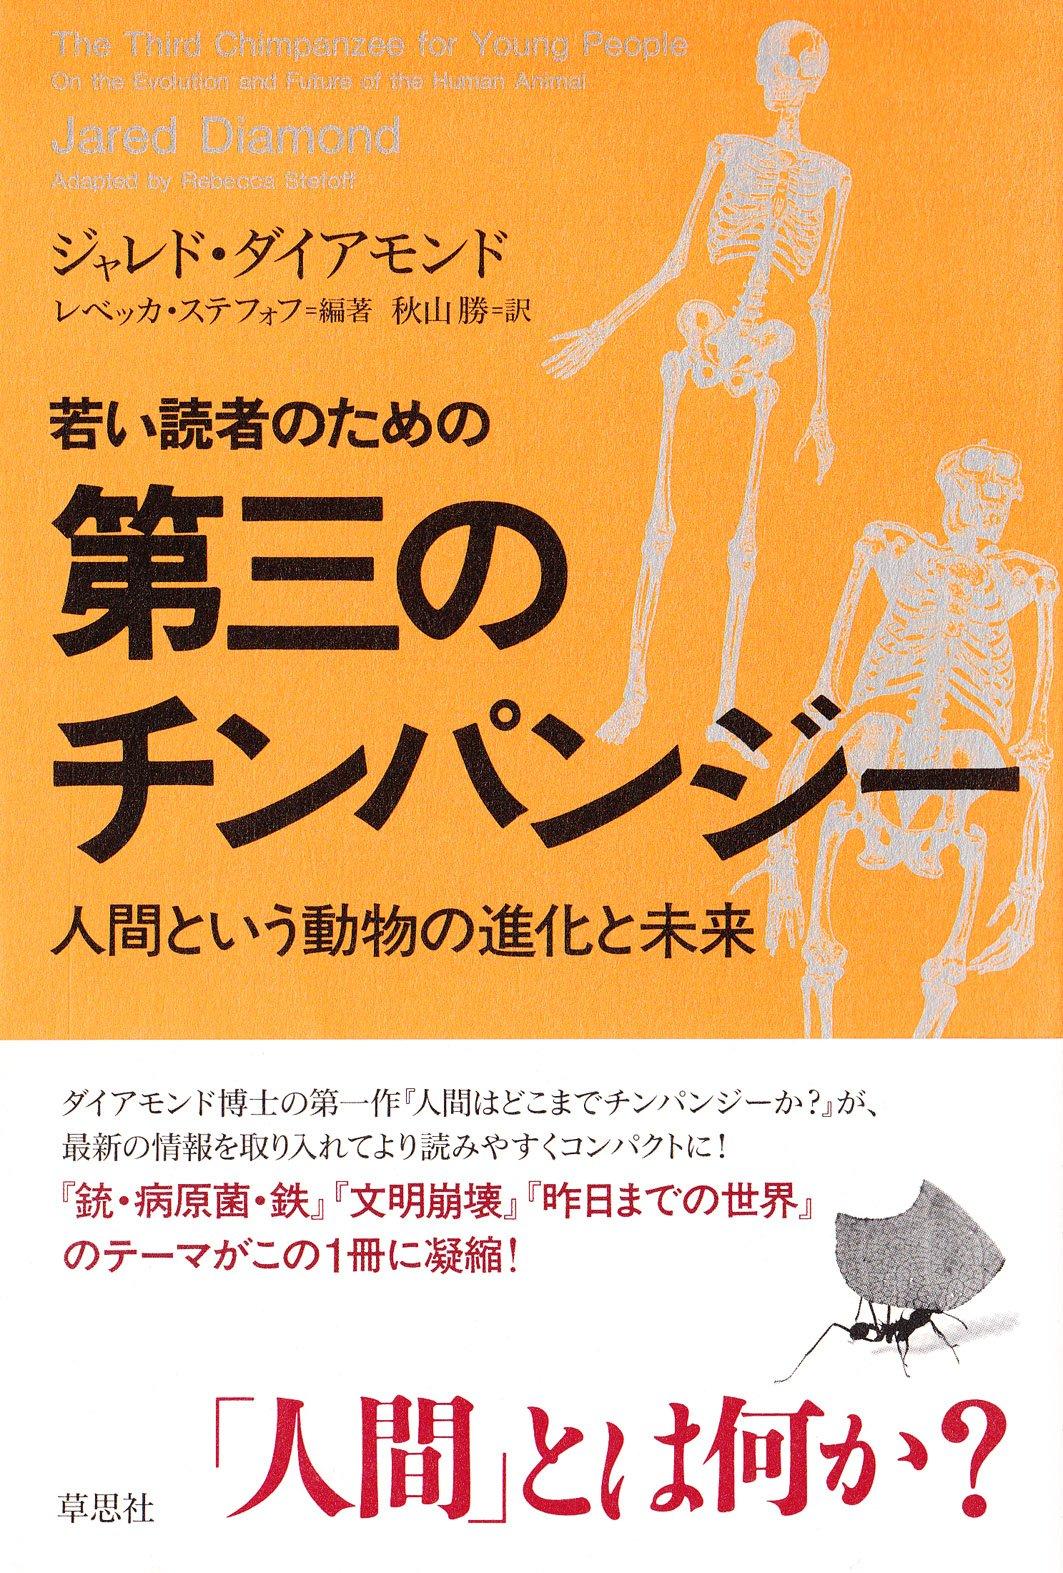 3rd-chimpangee_cover.jpg